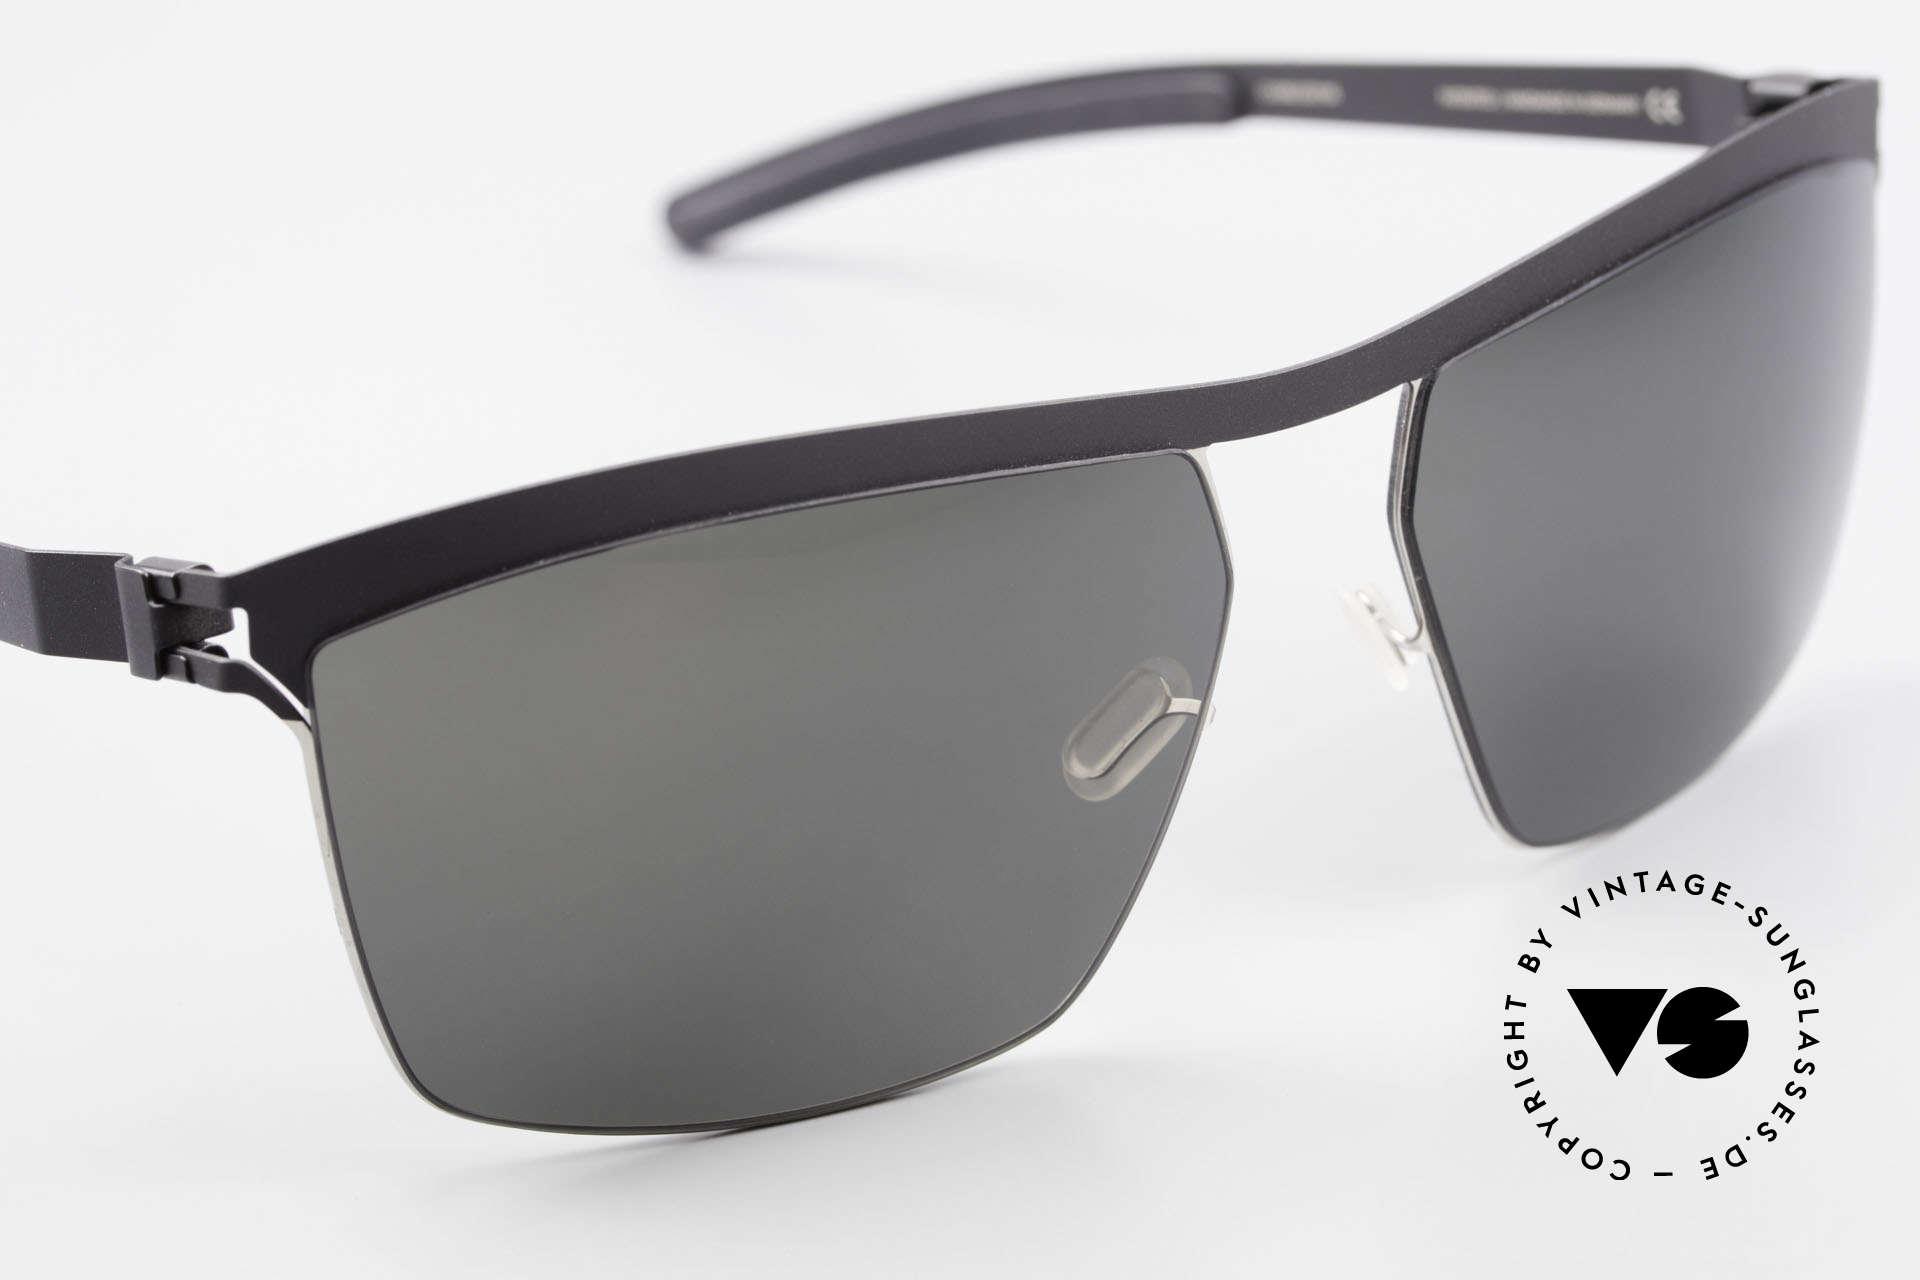 Mykita Tiago Designer Unisex Sunglasses, top-notch quality, made in Germany (Berlin-Kreuzberg), Made for Men and Women